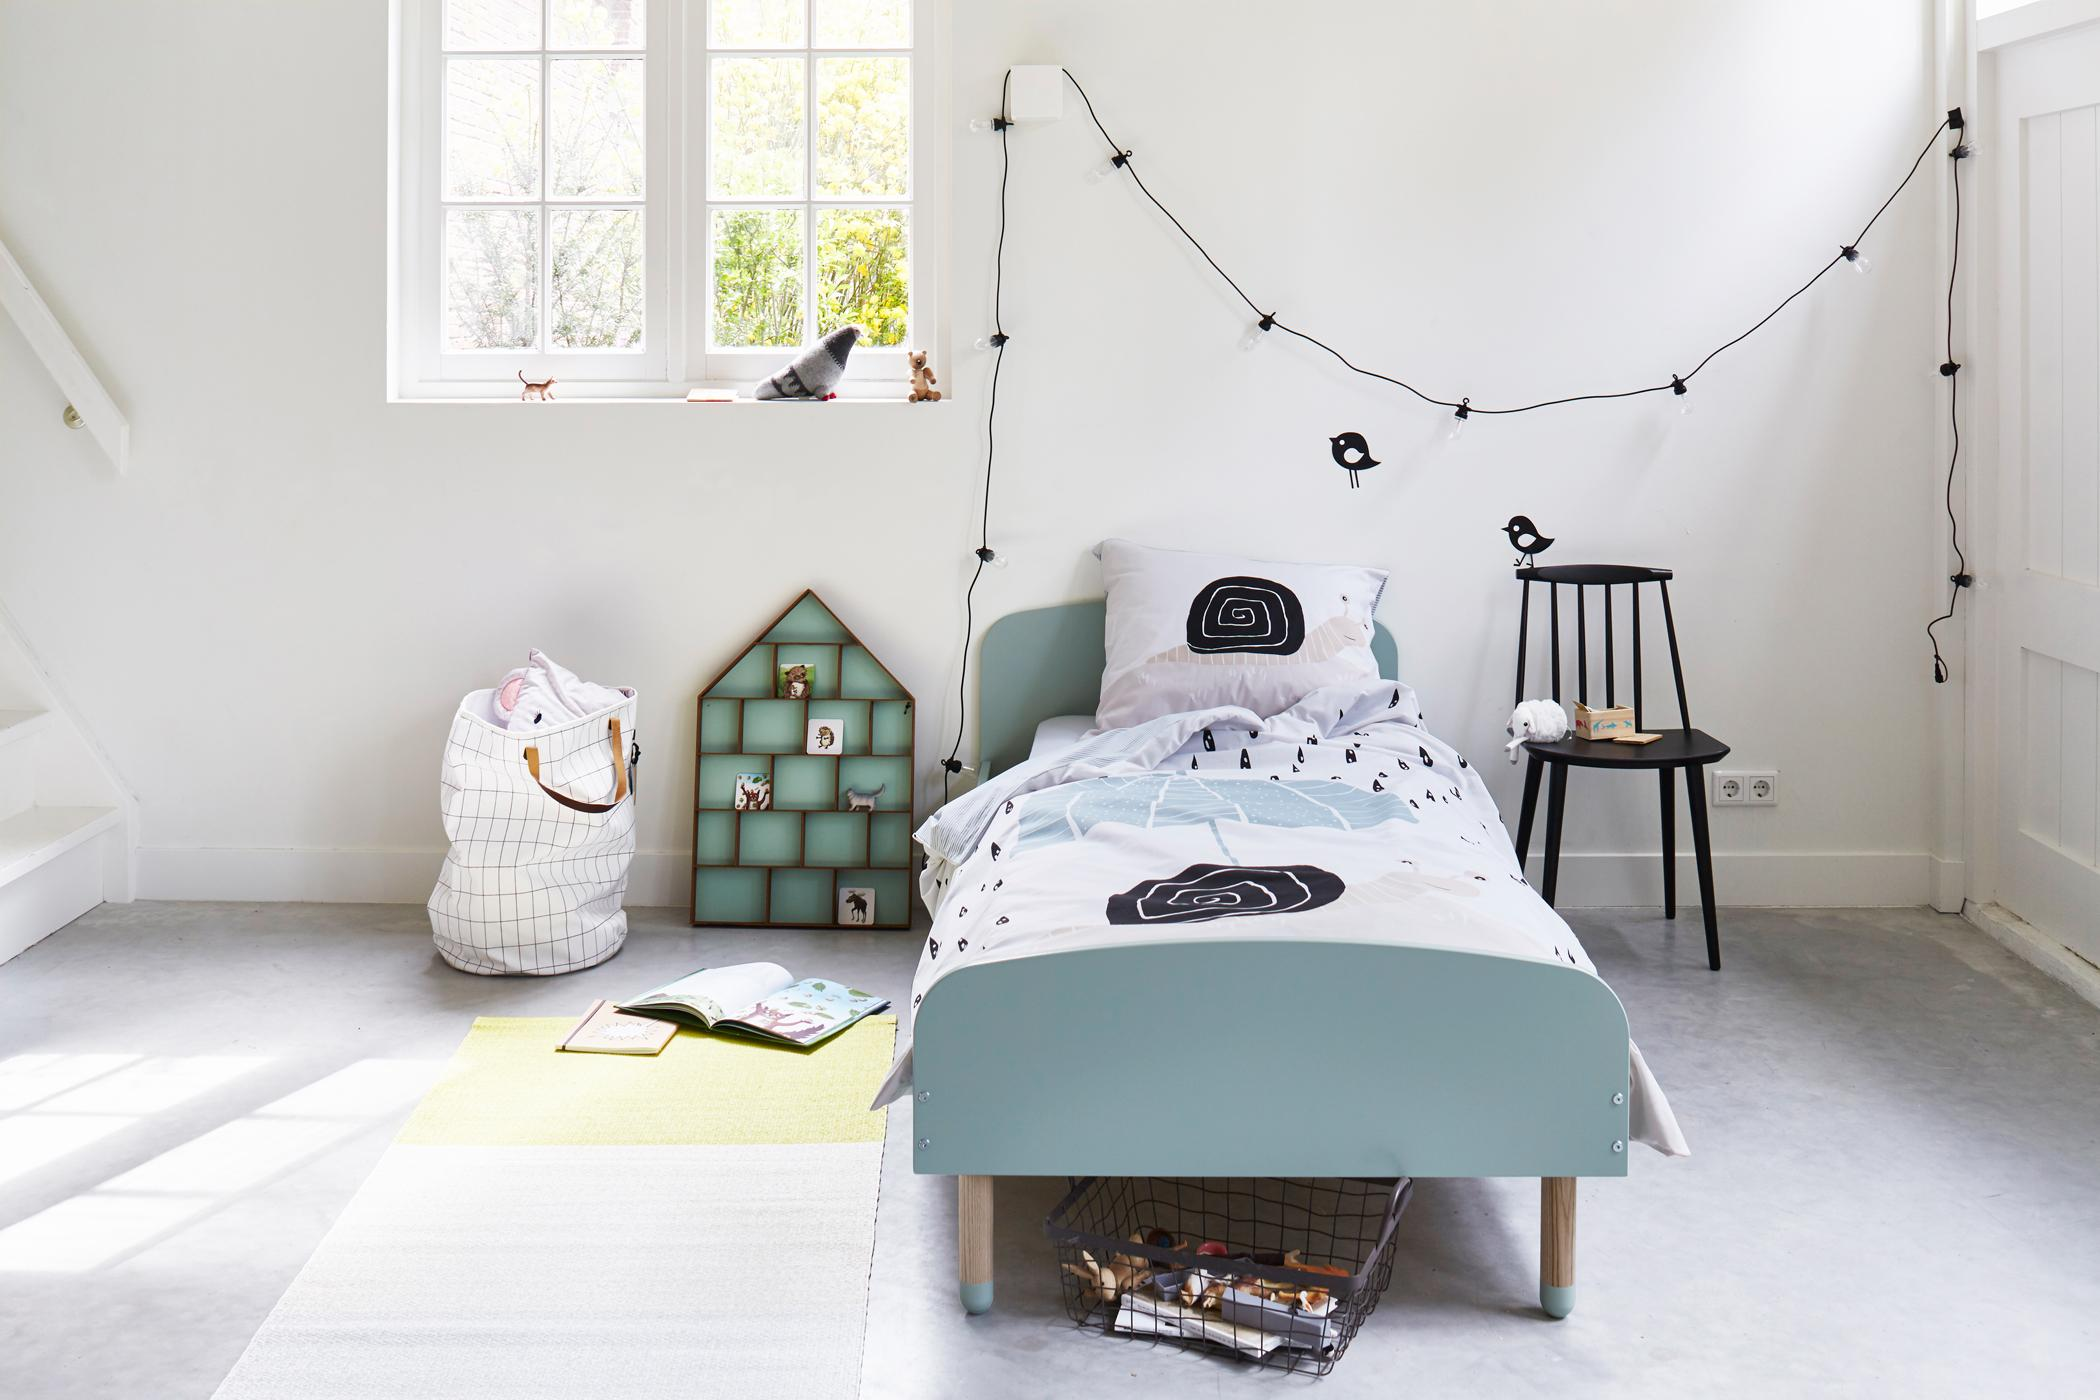 kinderbett bilder ideen couchstyle. Black Bedroom Furniture Sets. Home Design Ideas